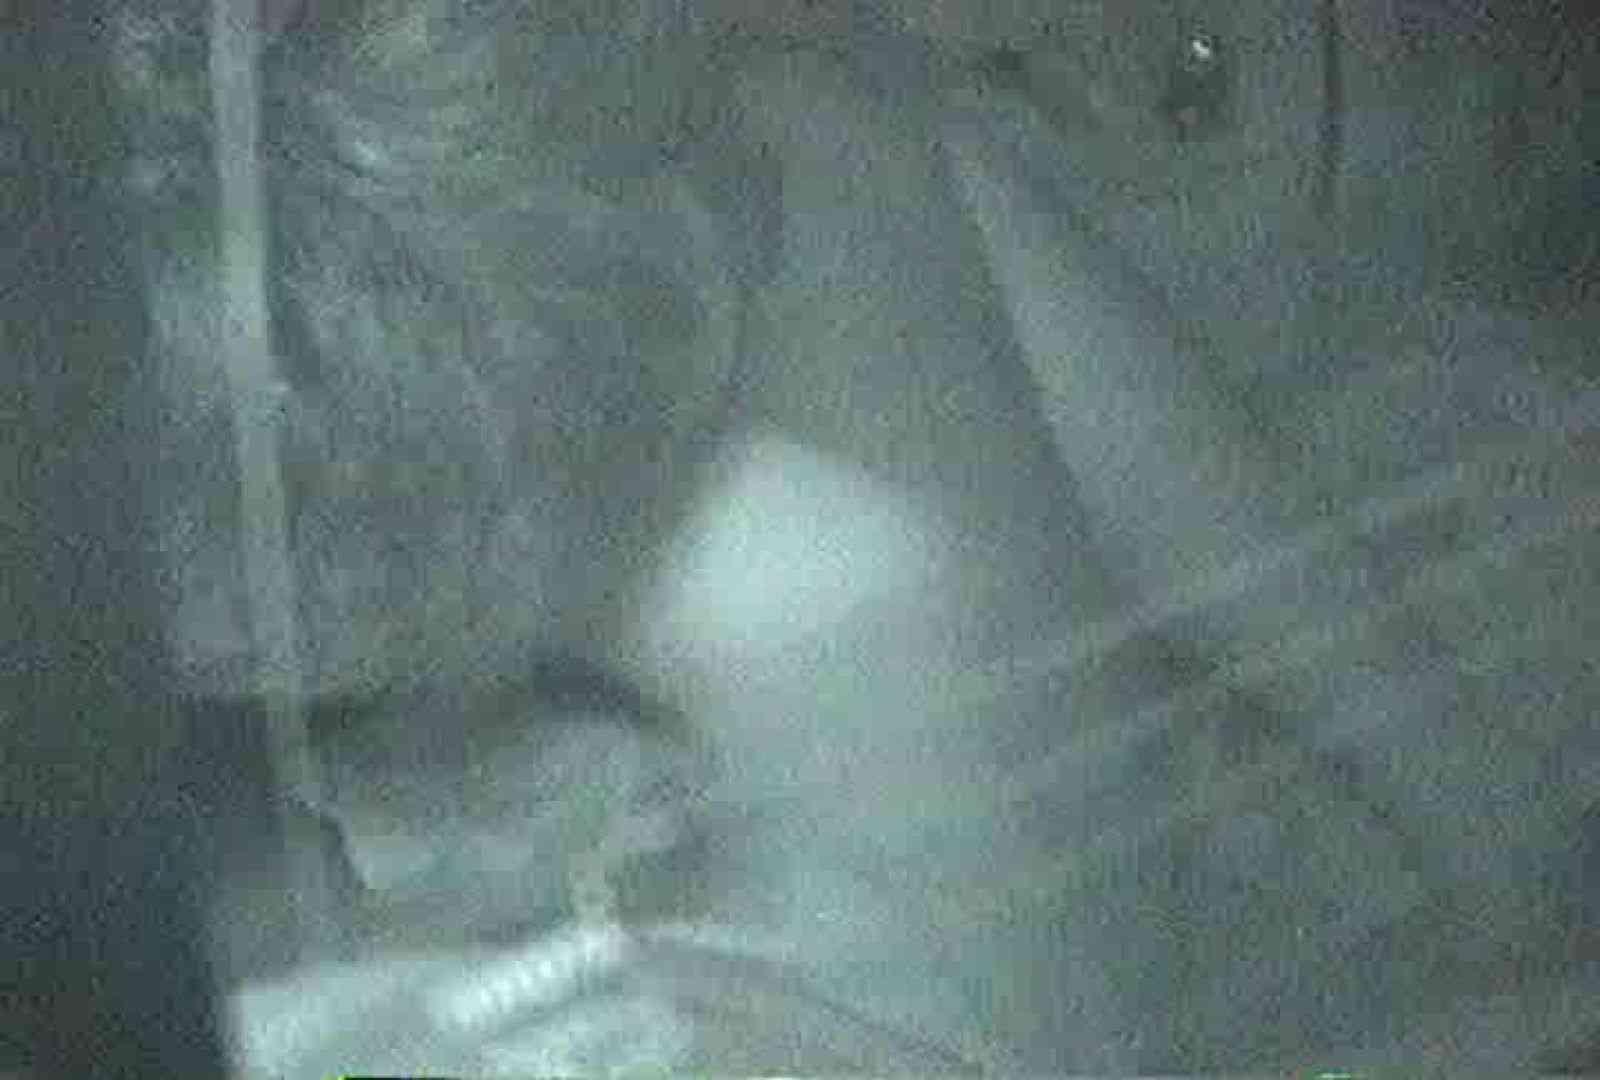 充血監督の深夜の運動会Vol.48 淫乱 スケベ動画紹介 63連発 10